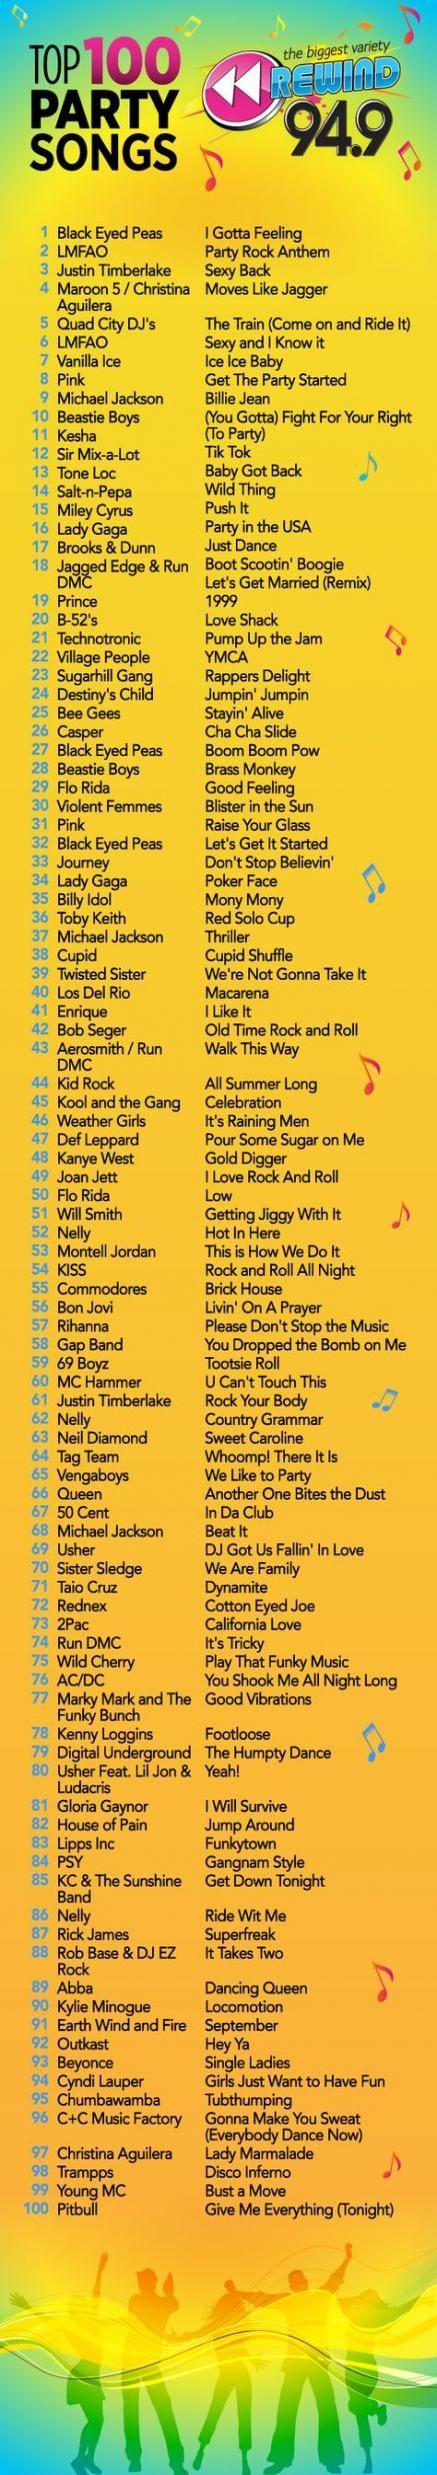 Wedding Reception Songs List 27+ New Ideas